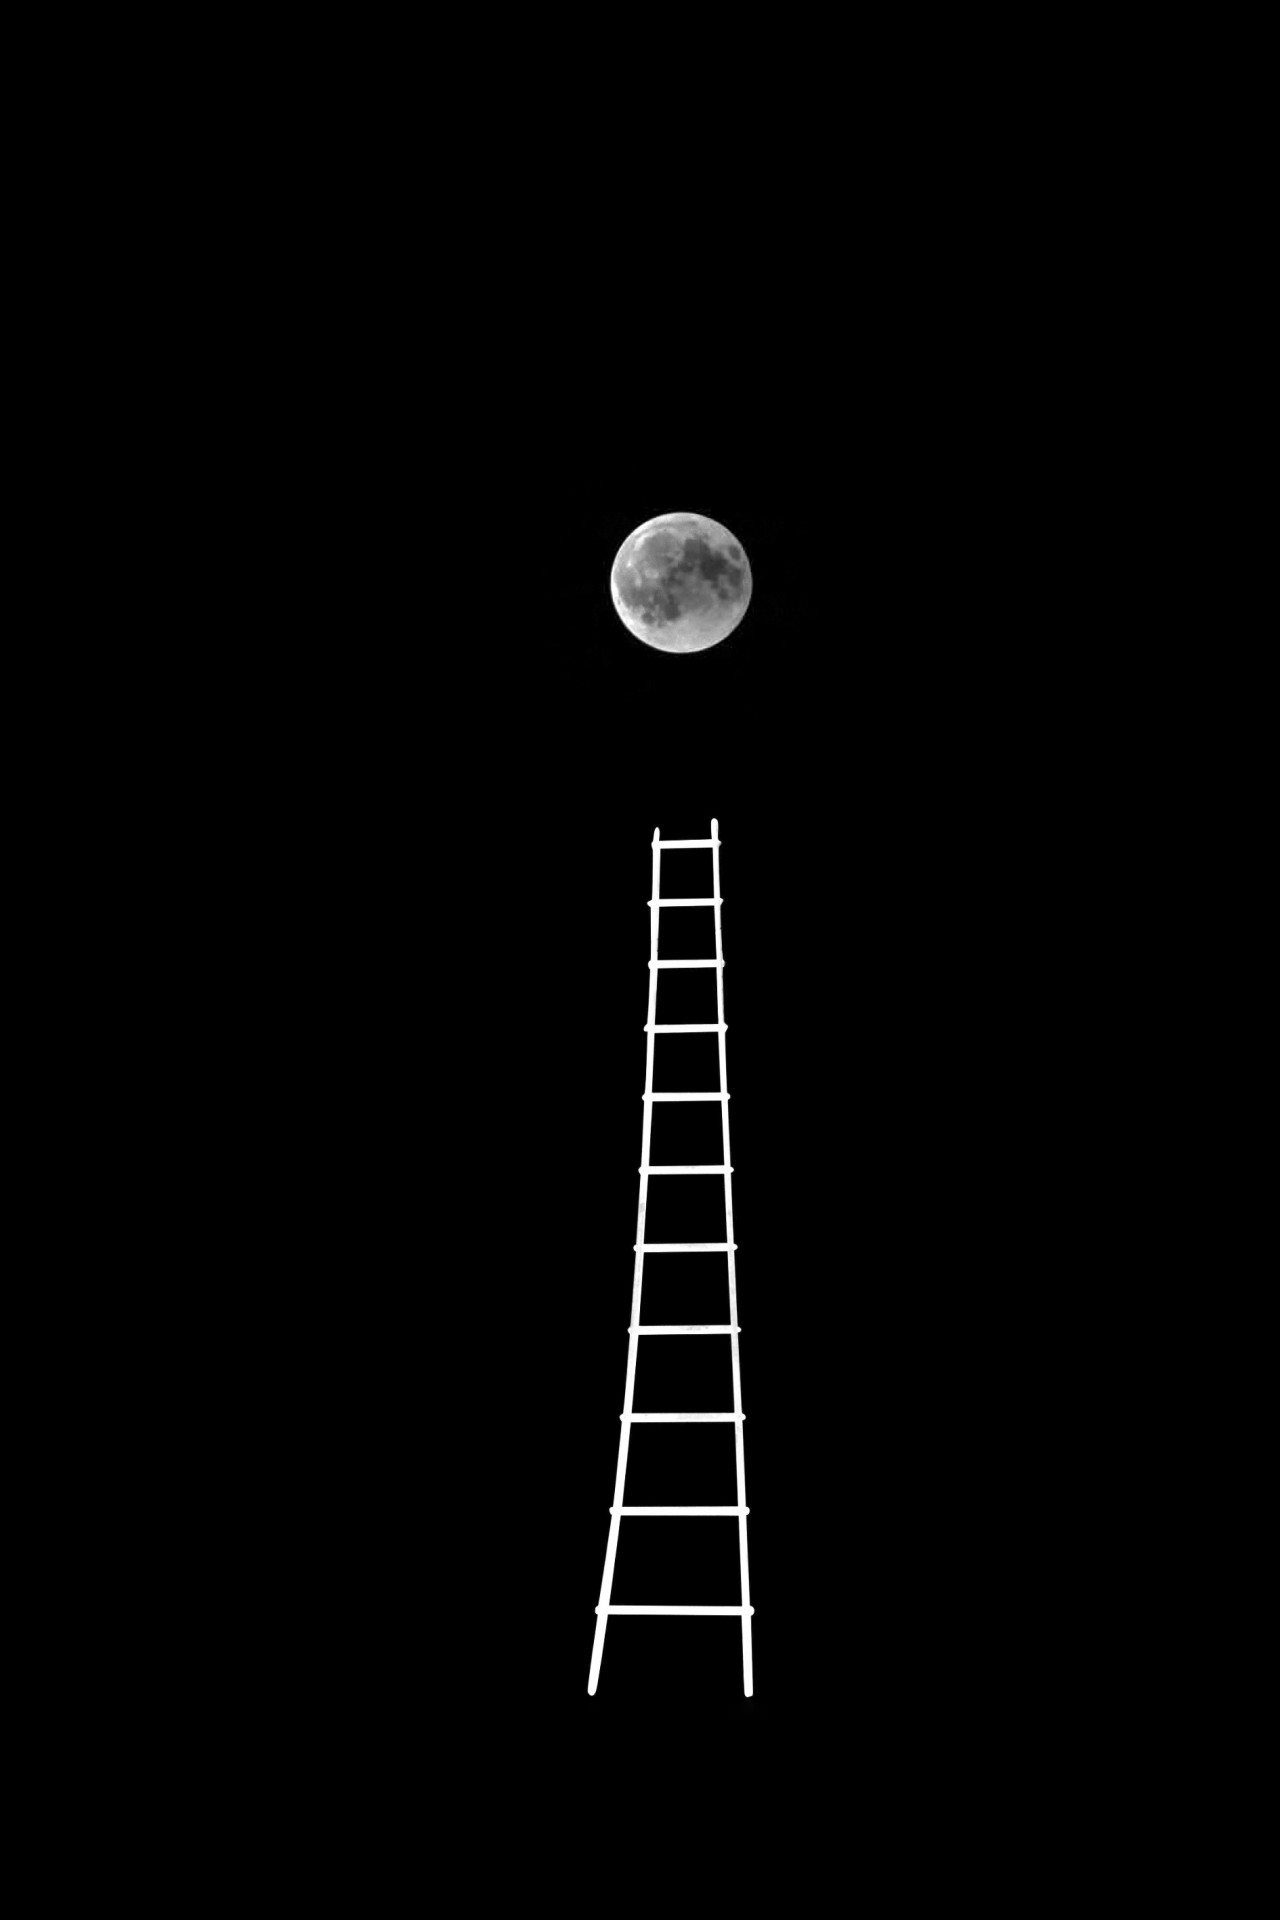 Лунная лестница, 2018. Фотограф Пол Купидо